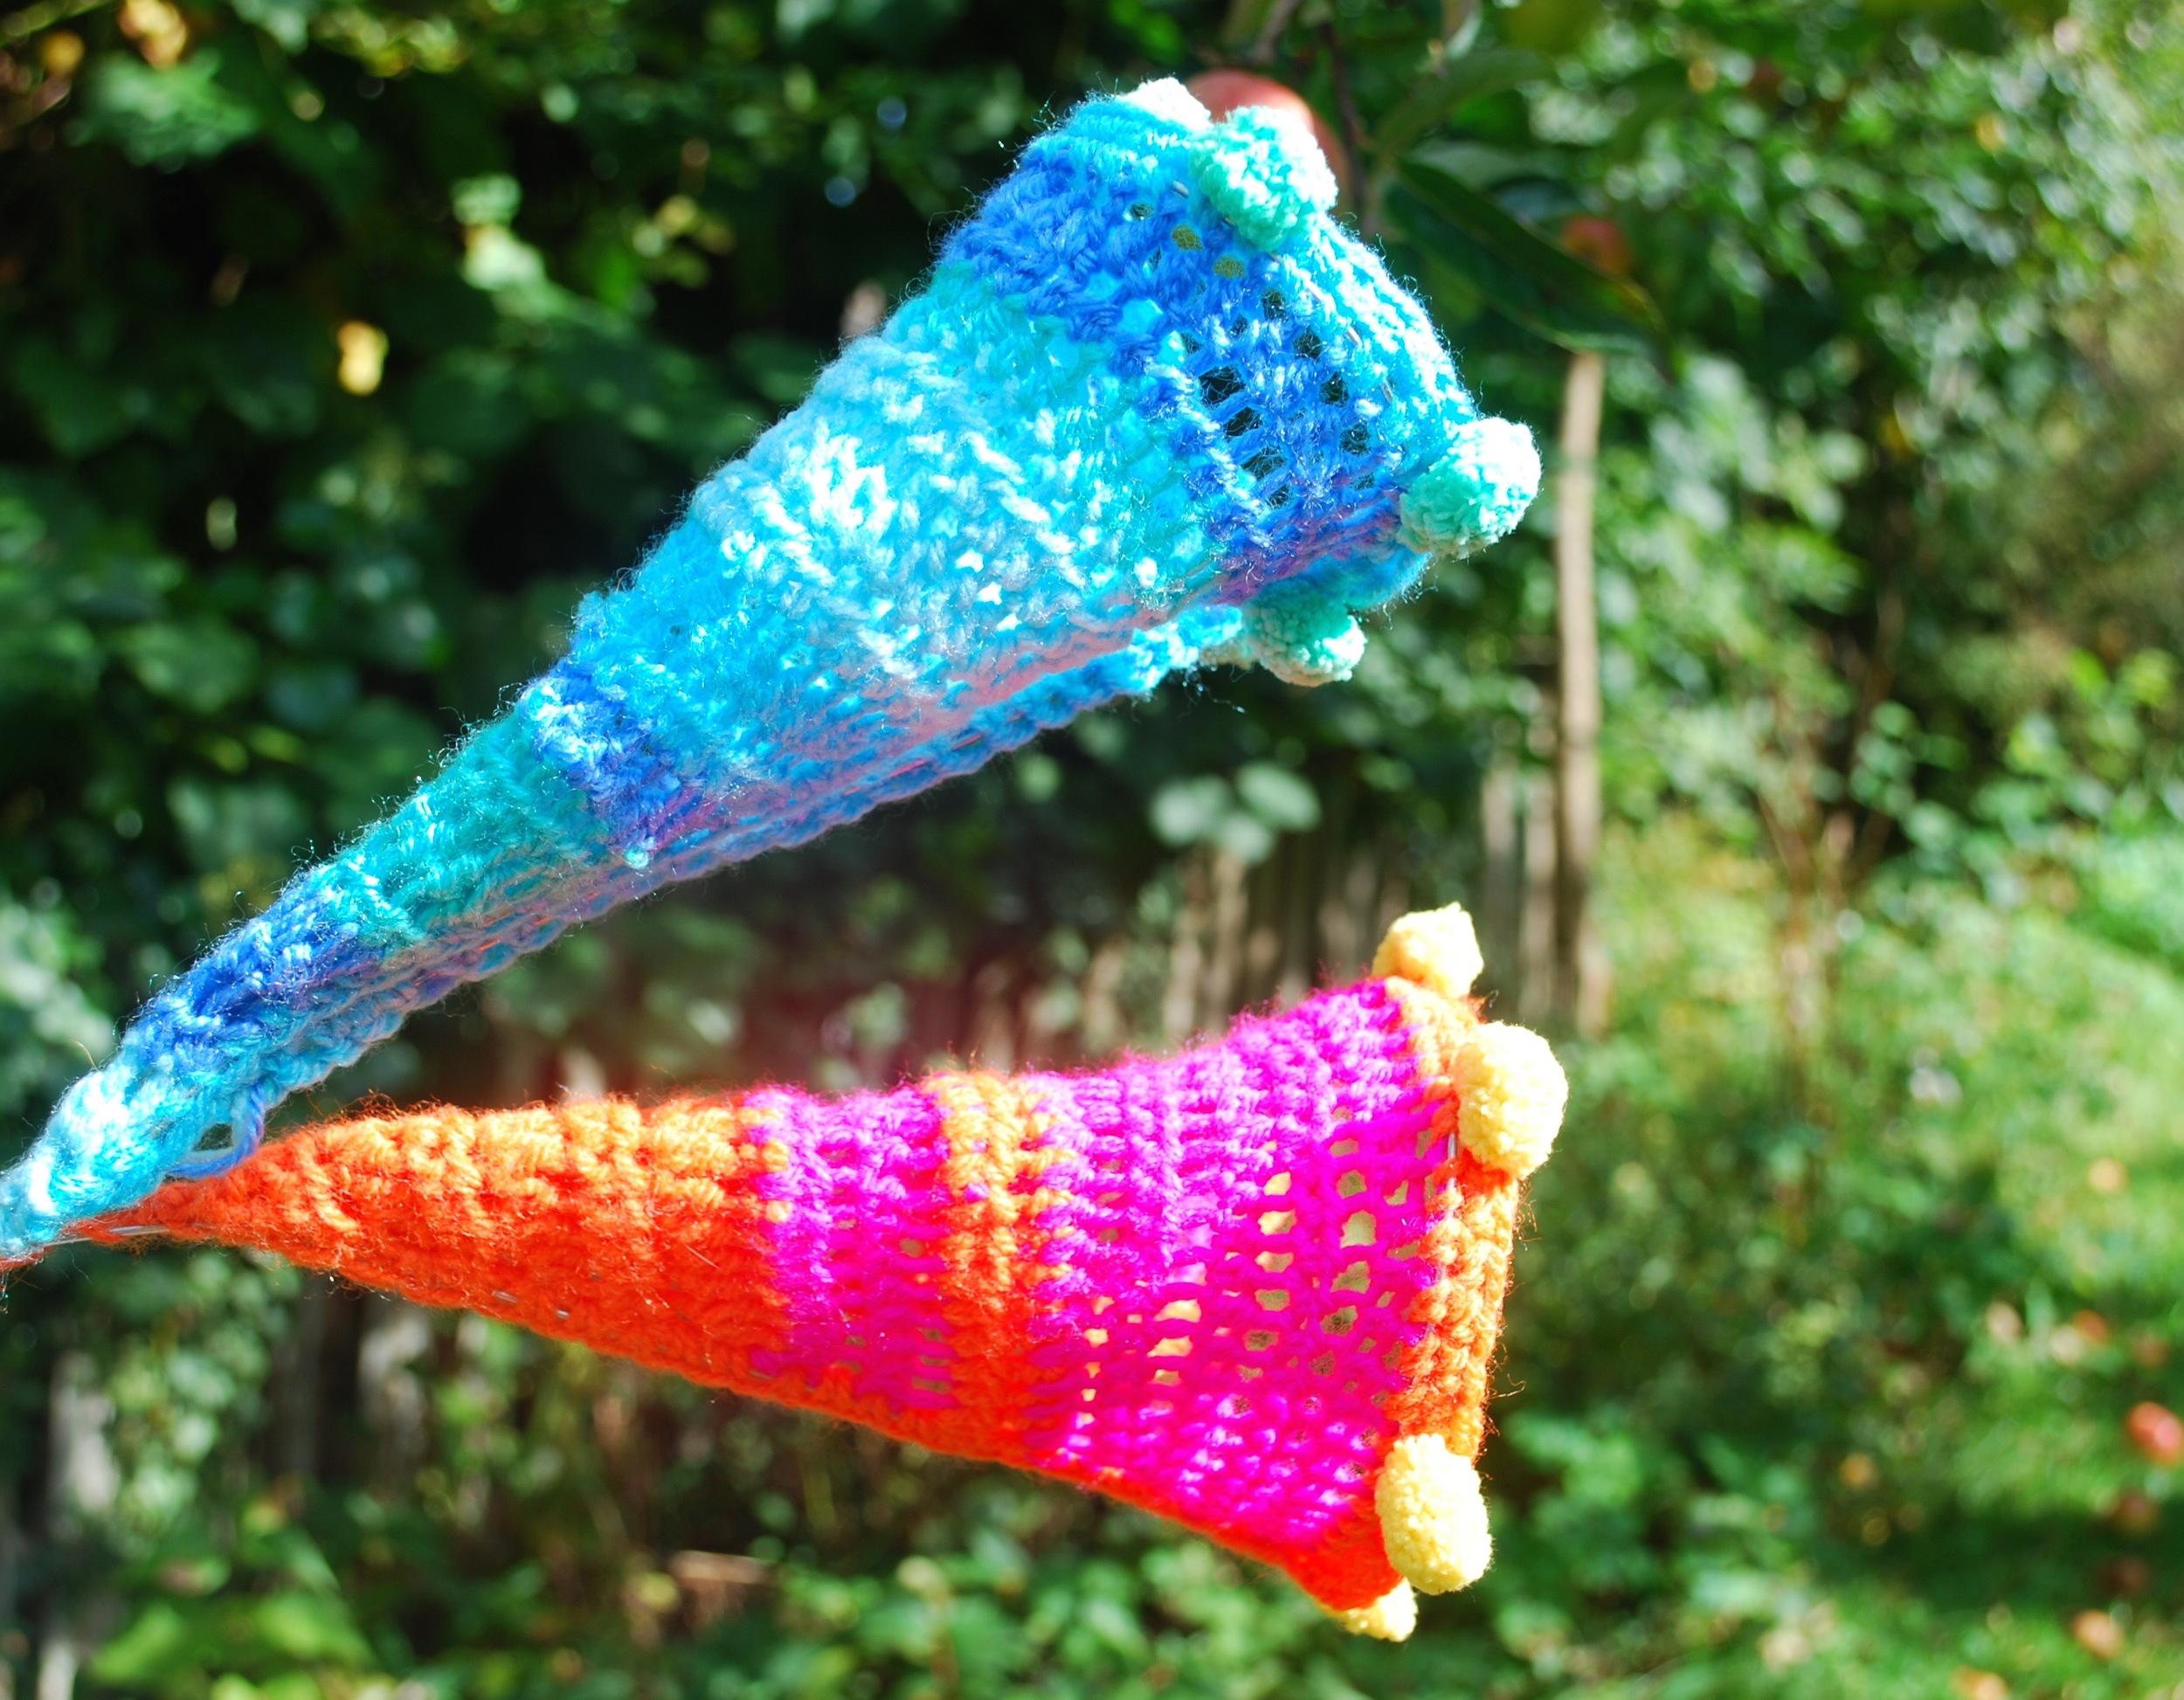 Sculptural crochet flowers in garden